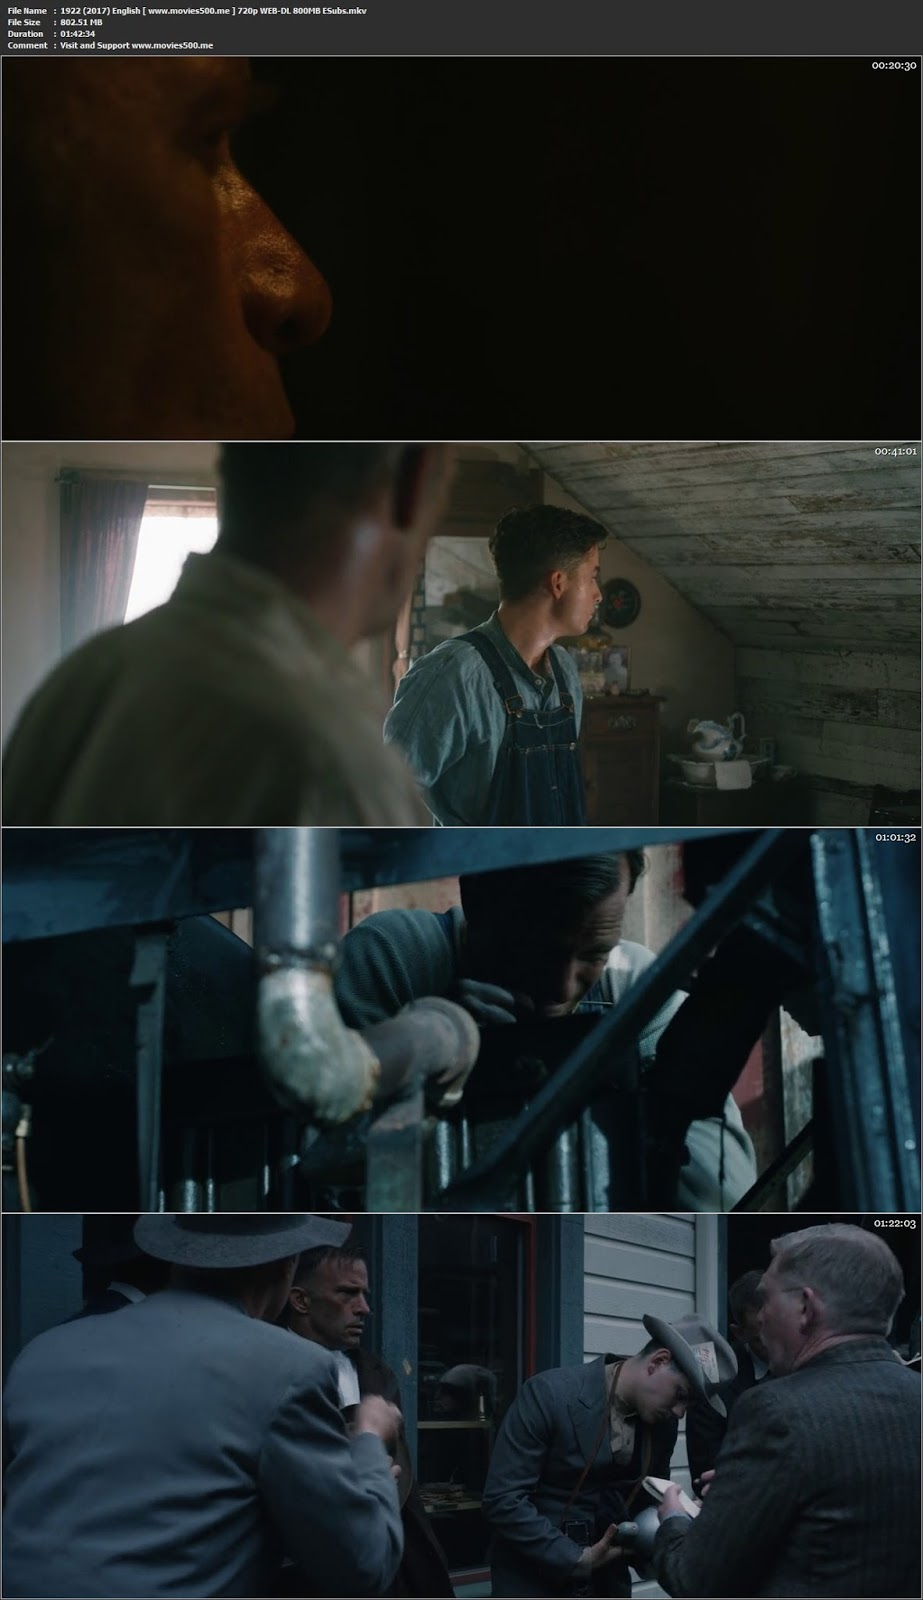 1922 (2017) English Full Movie WEB DL 720p ESubs at newbtcbank.com